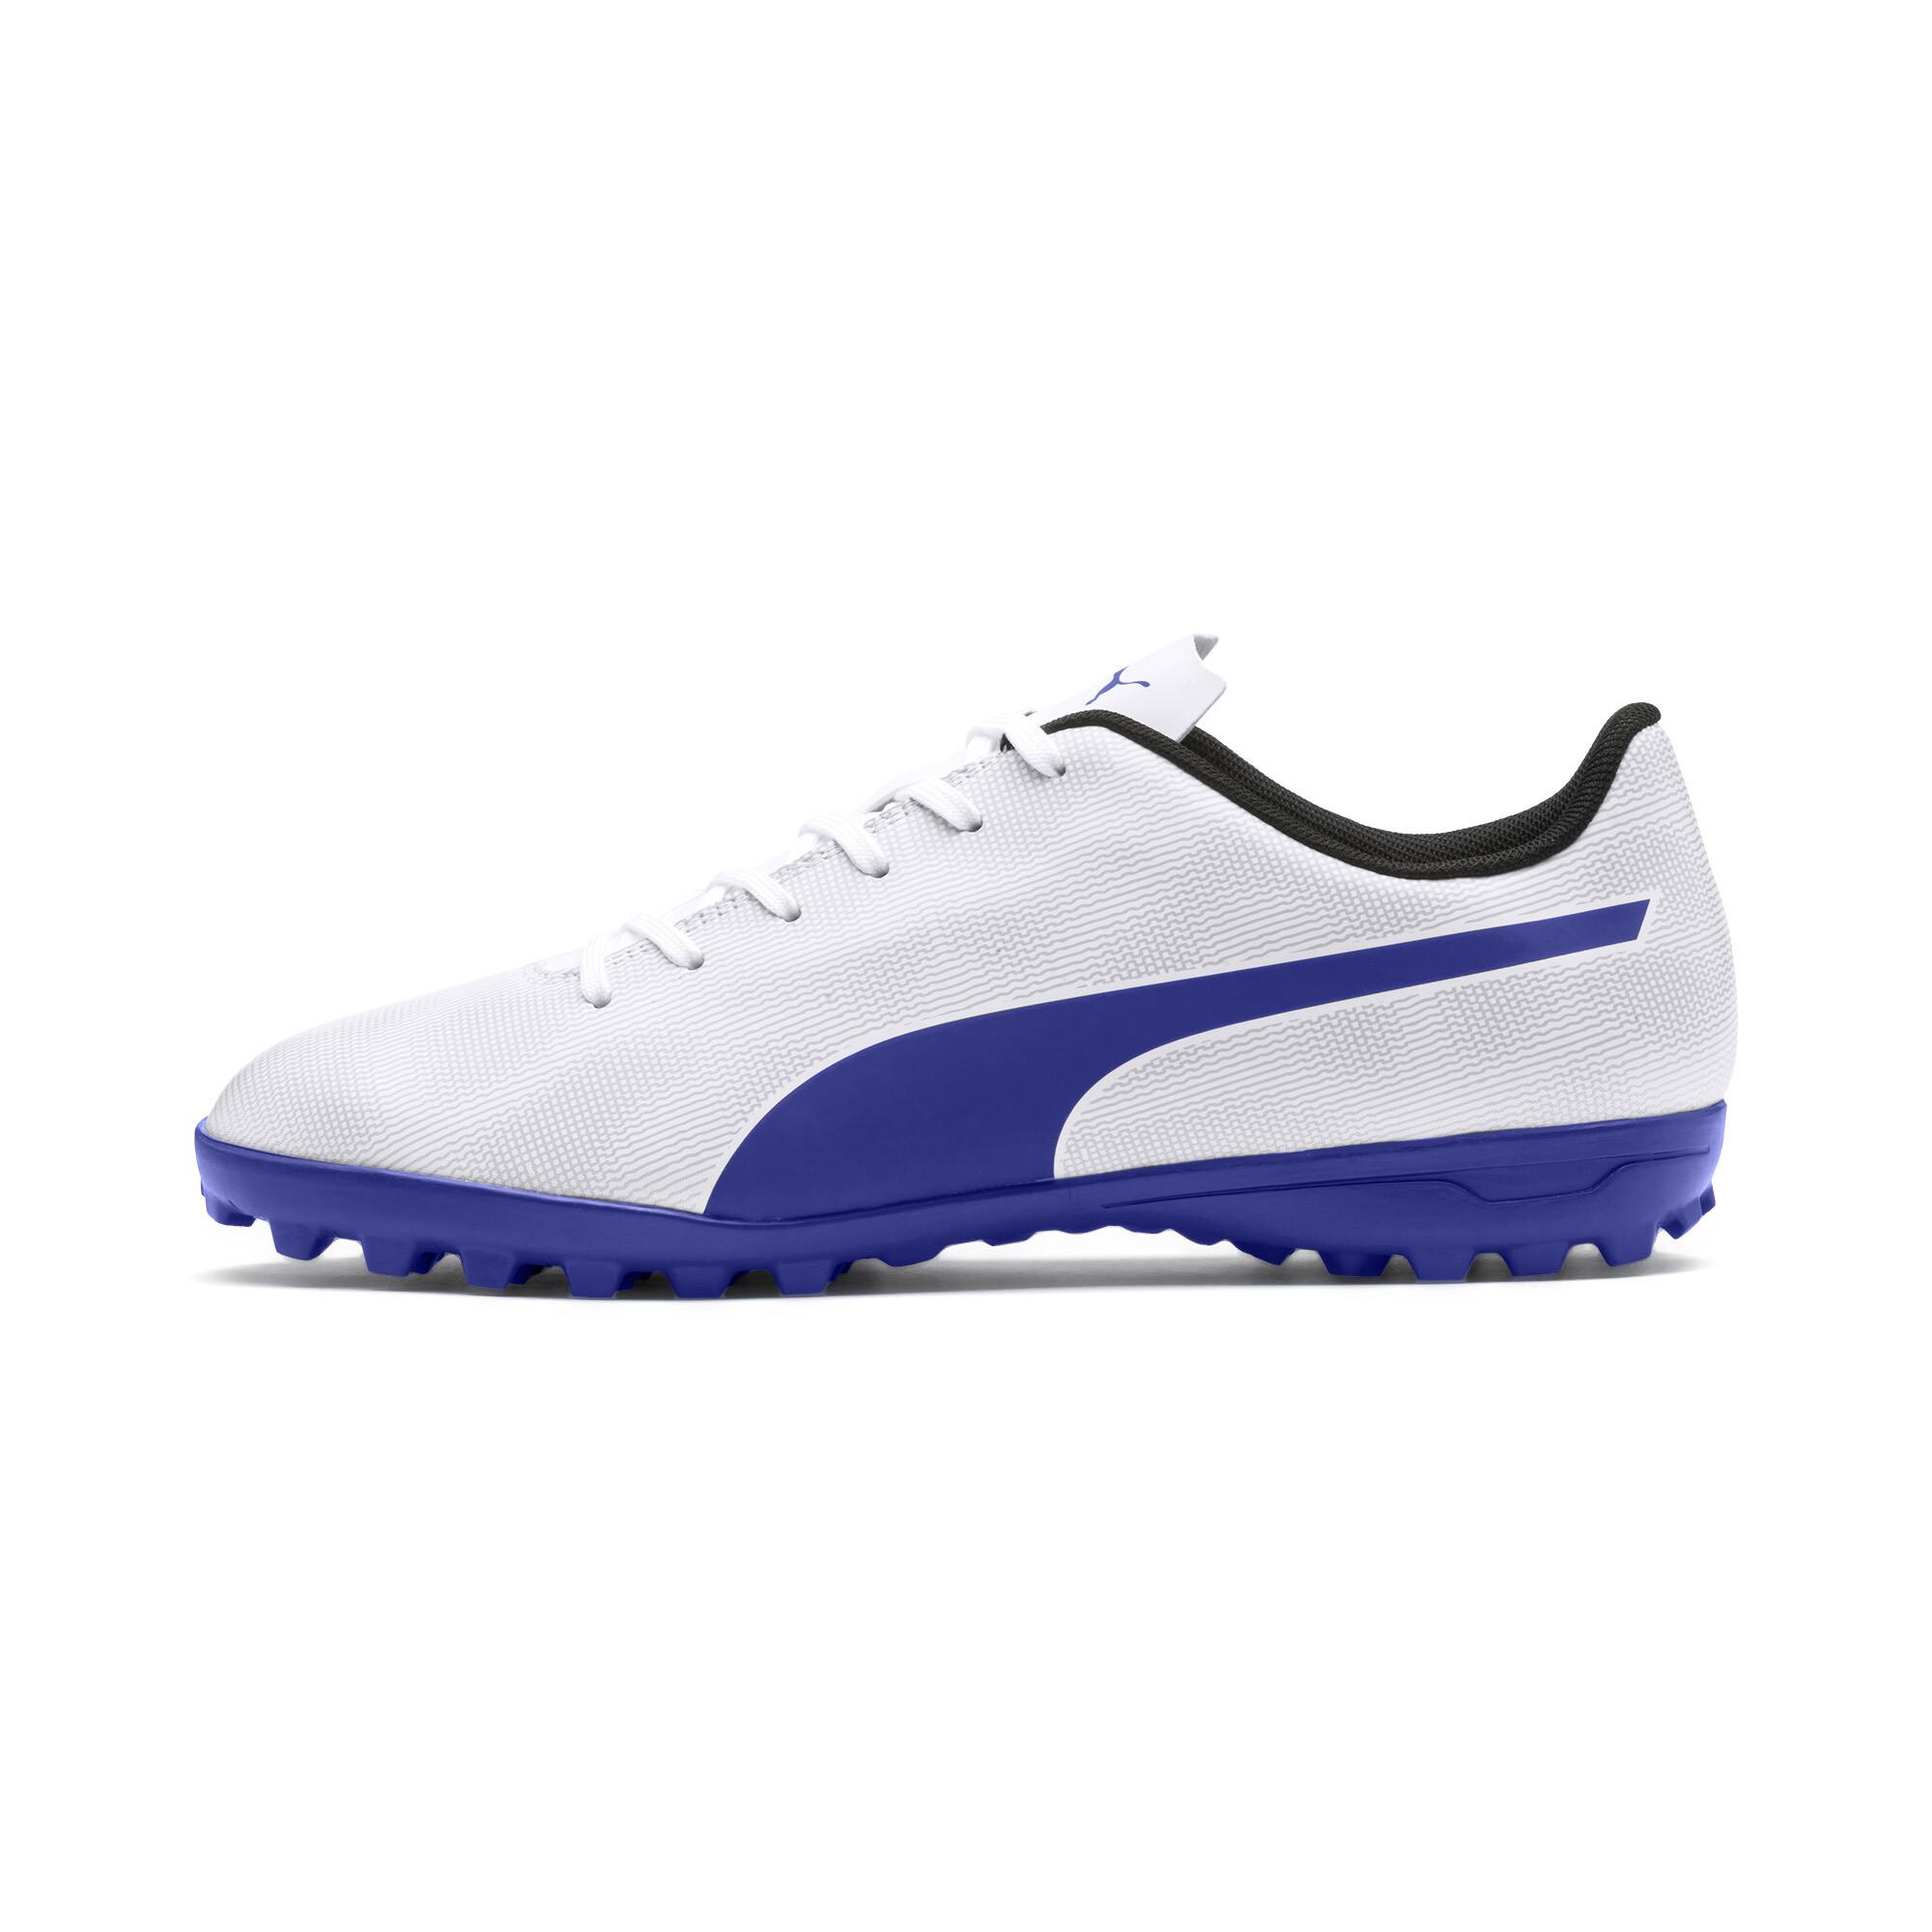 PUMA-Rapido-TT-Men-s-Soccer-Cleats-Men-Shoe-Football thumbnail 11